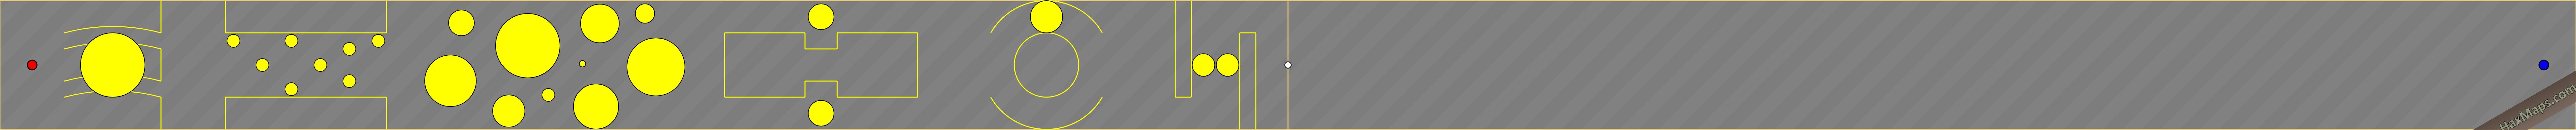 hax ball maps   Yellow-1